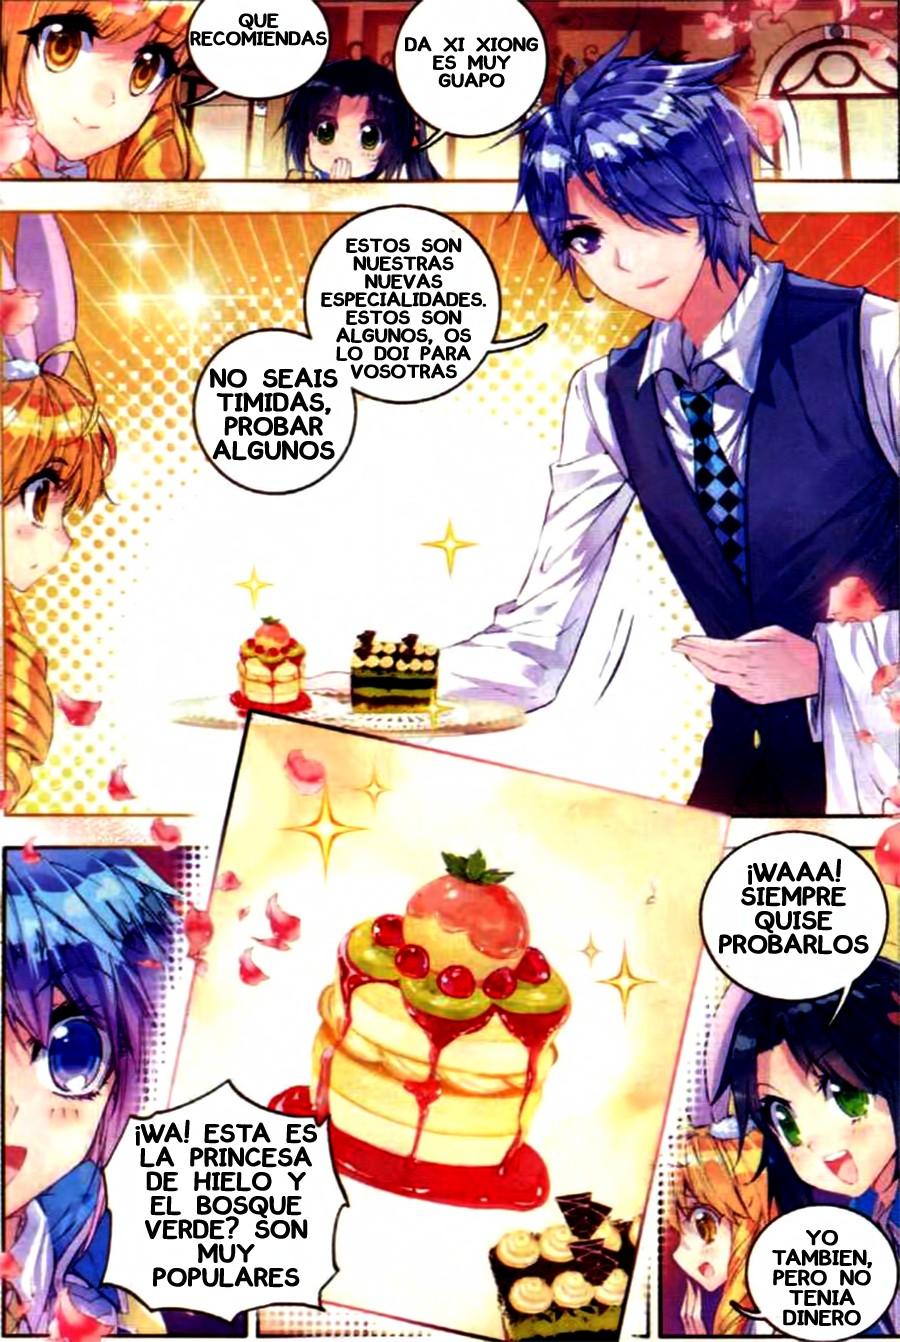 http://c5.ninemanga.com/es_manga/33/16417/435103/4d046659e1ad67b44d425b5a1266bd1f.jpg Page 10